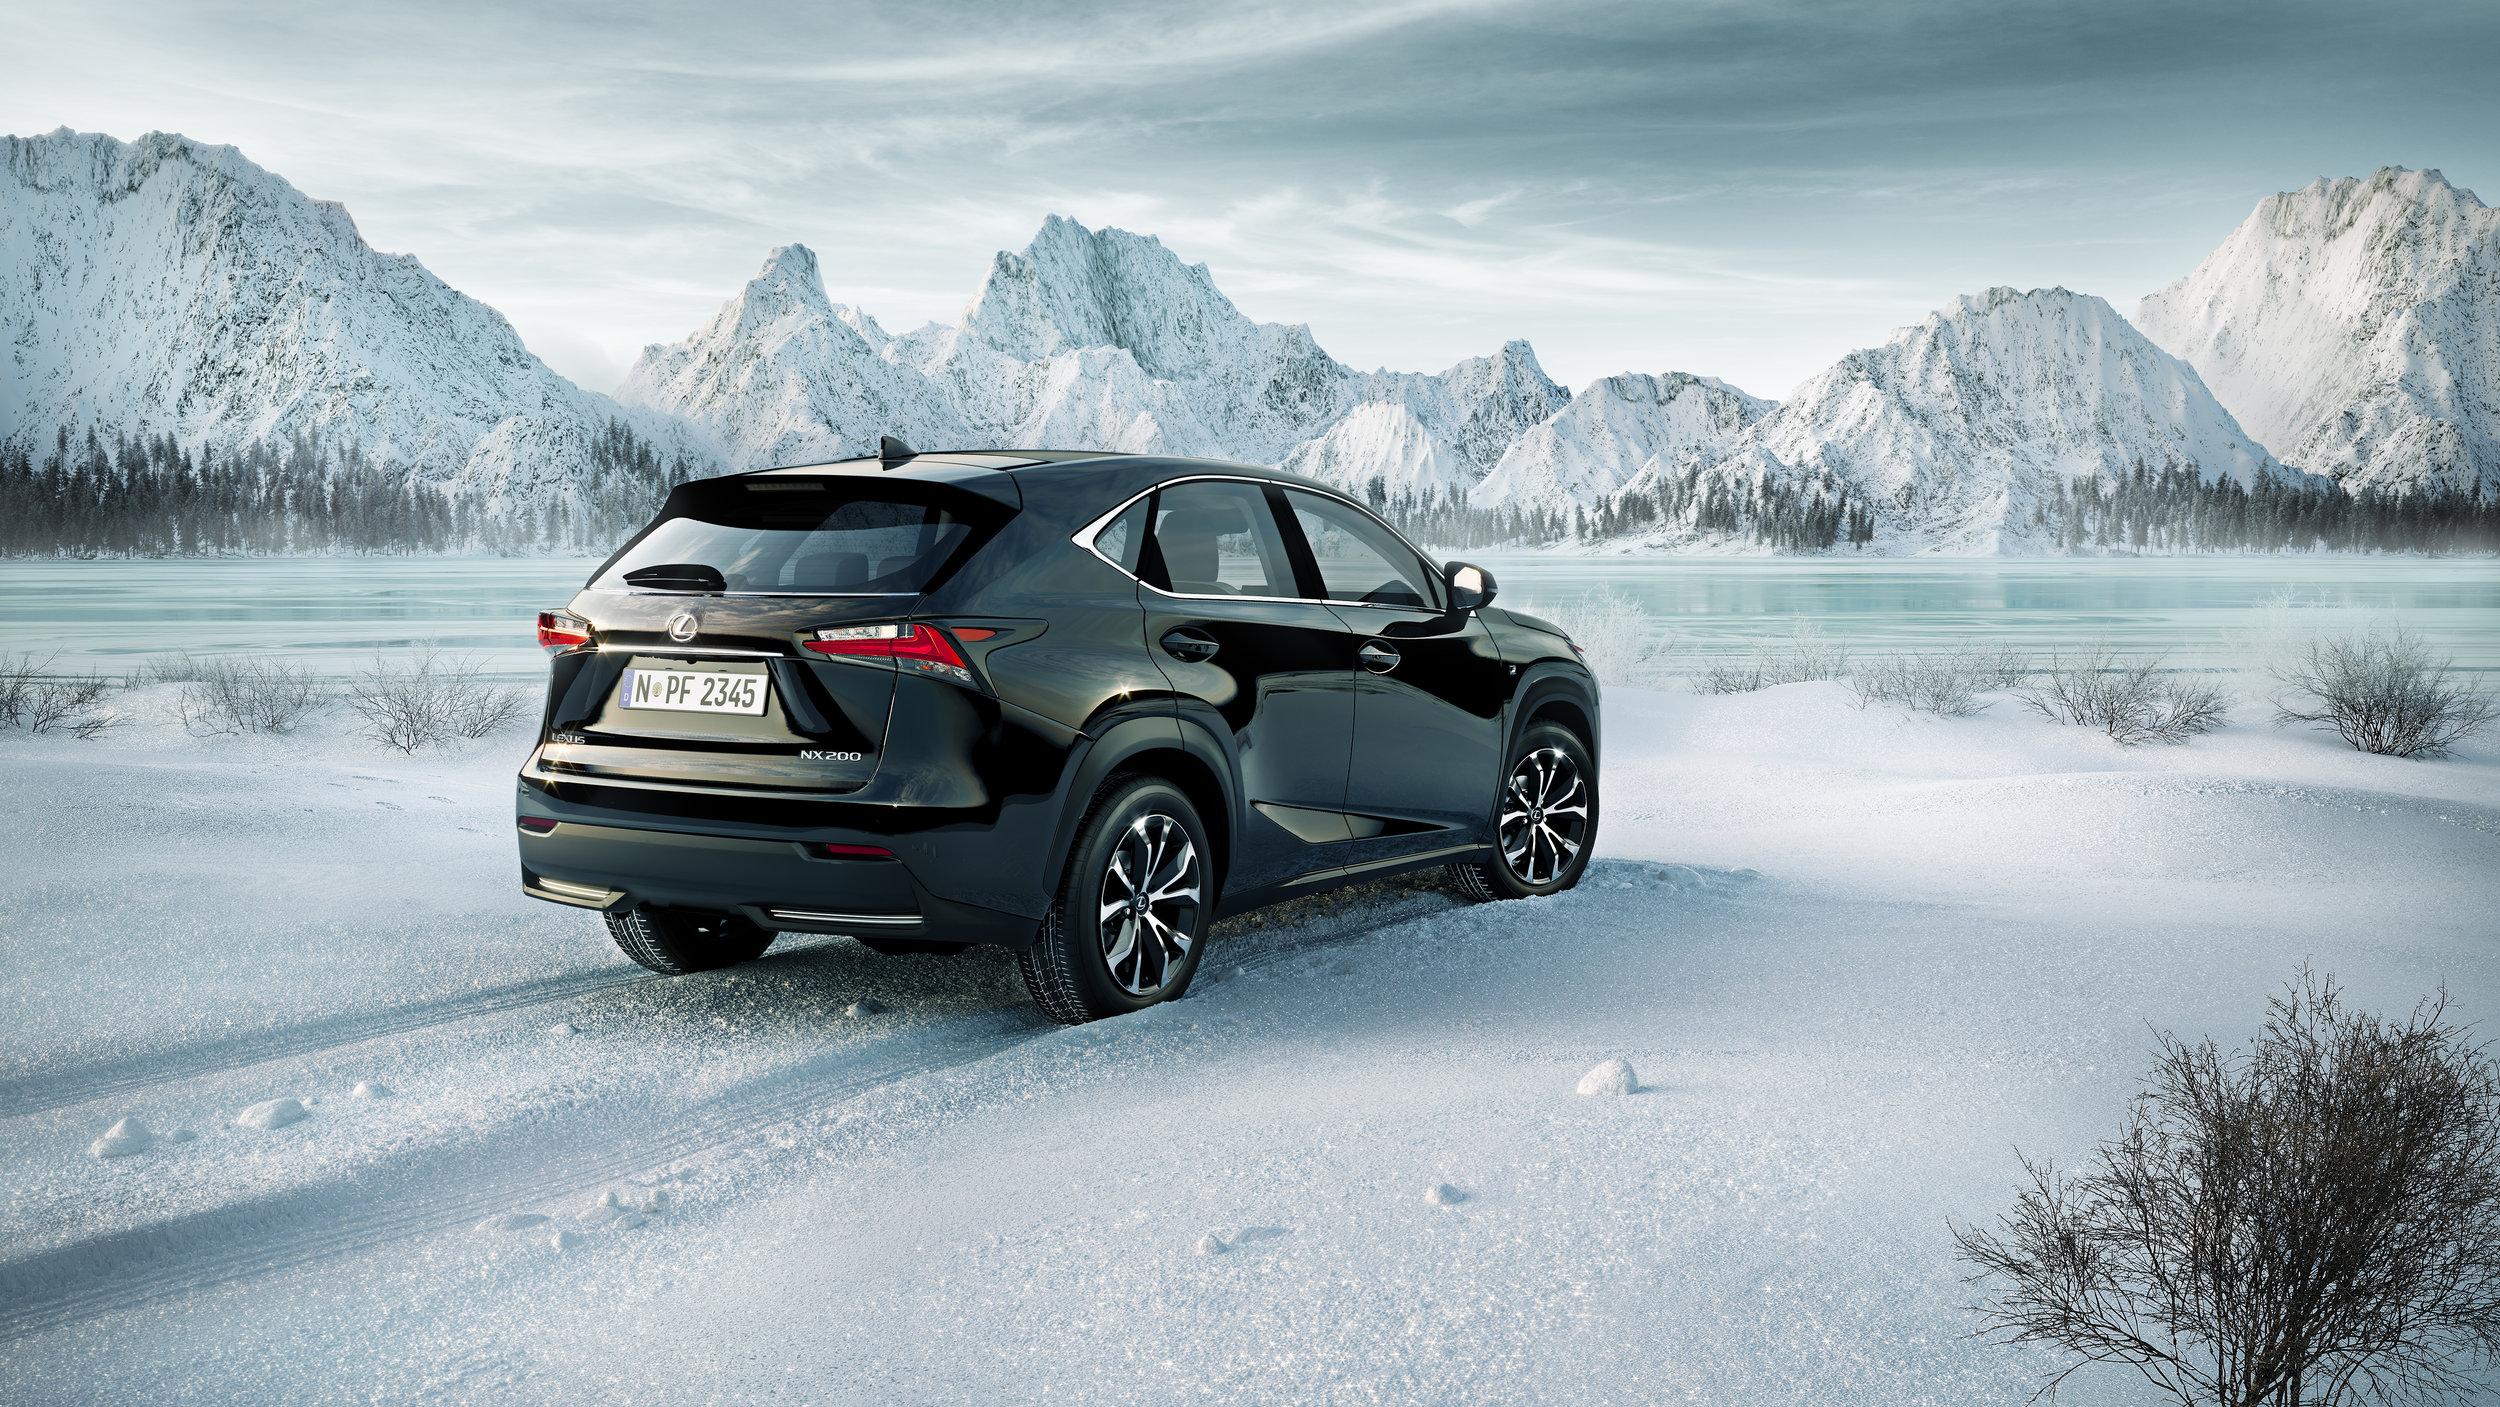 Lexus_NX_2017_Forest_Snow_Static.jpg